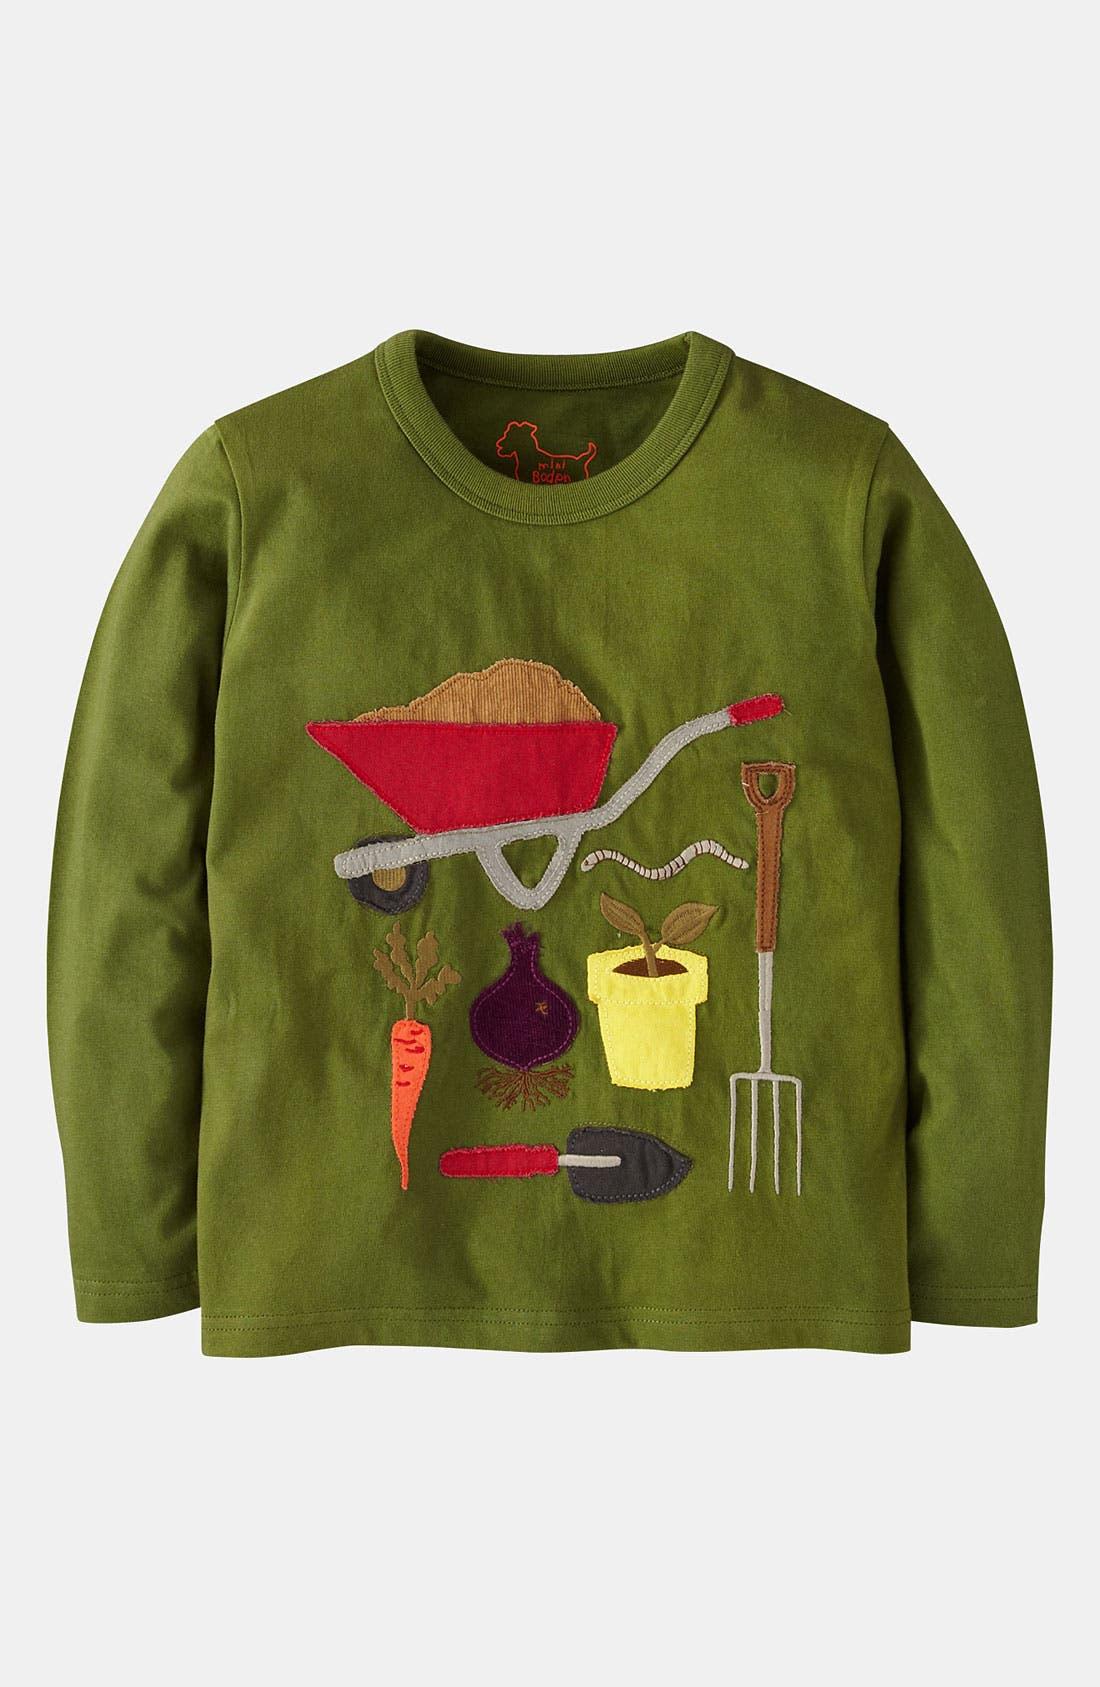 Main Image - Mini Boden 'Doing Stuff' T-Shirt (Toddler)